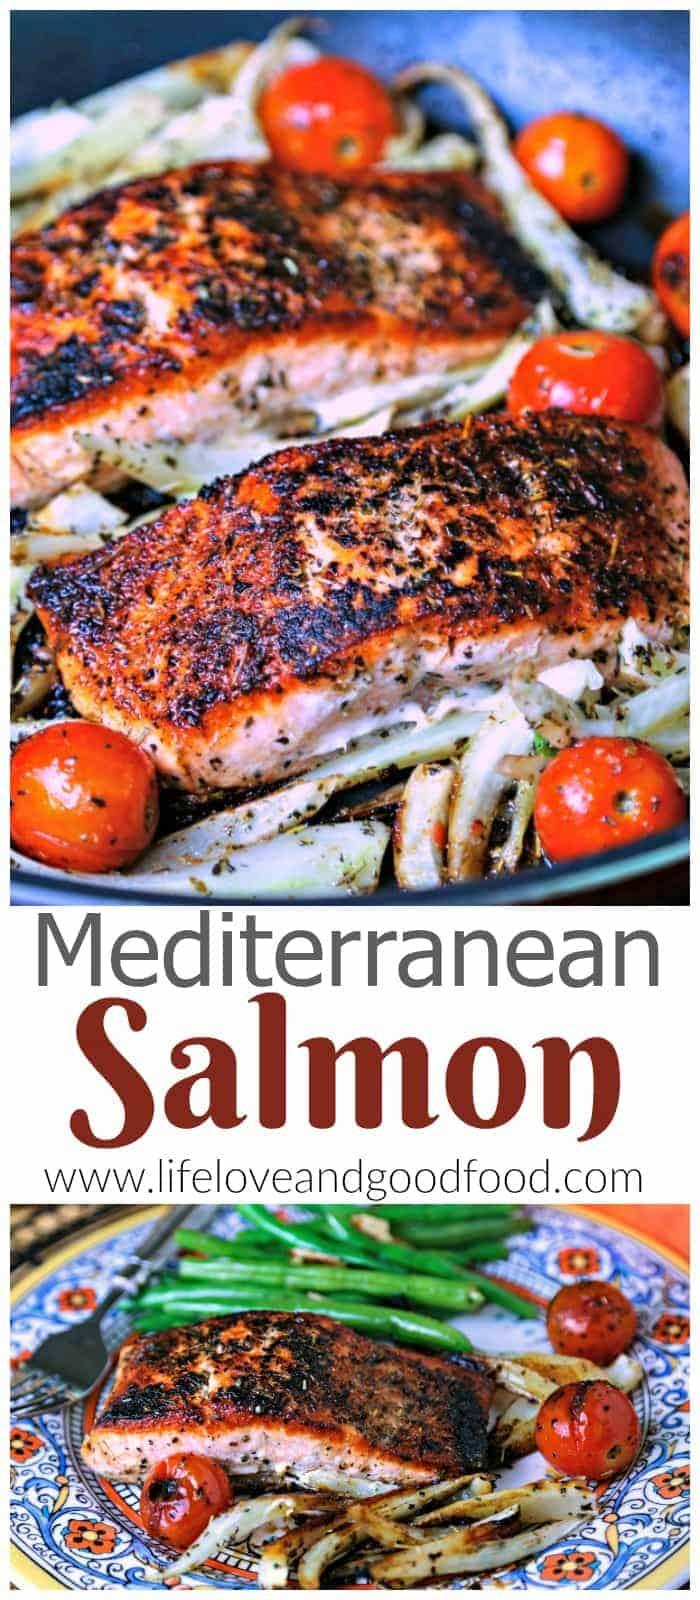 Mediterranean Salmon | Life, Love, and Good Food